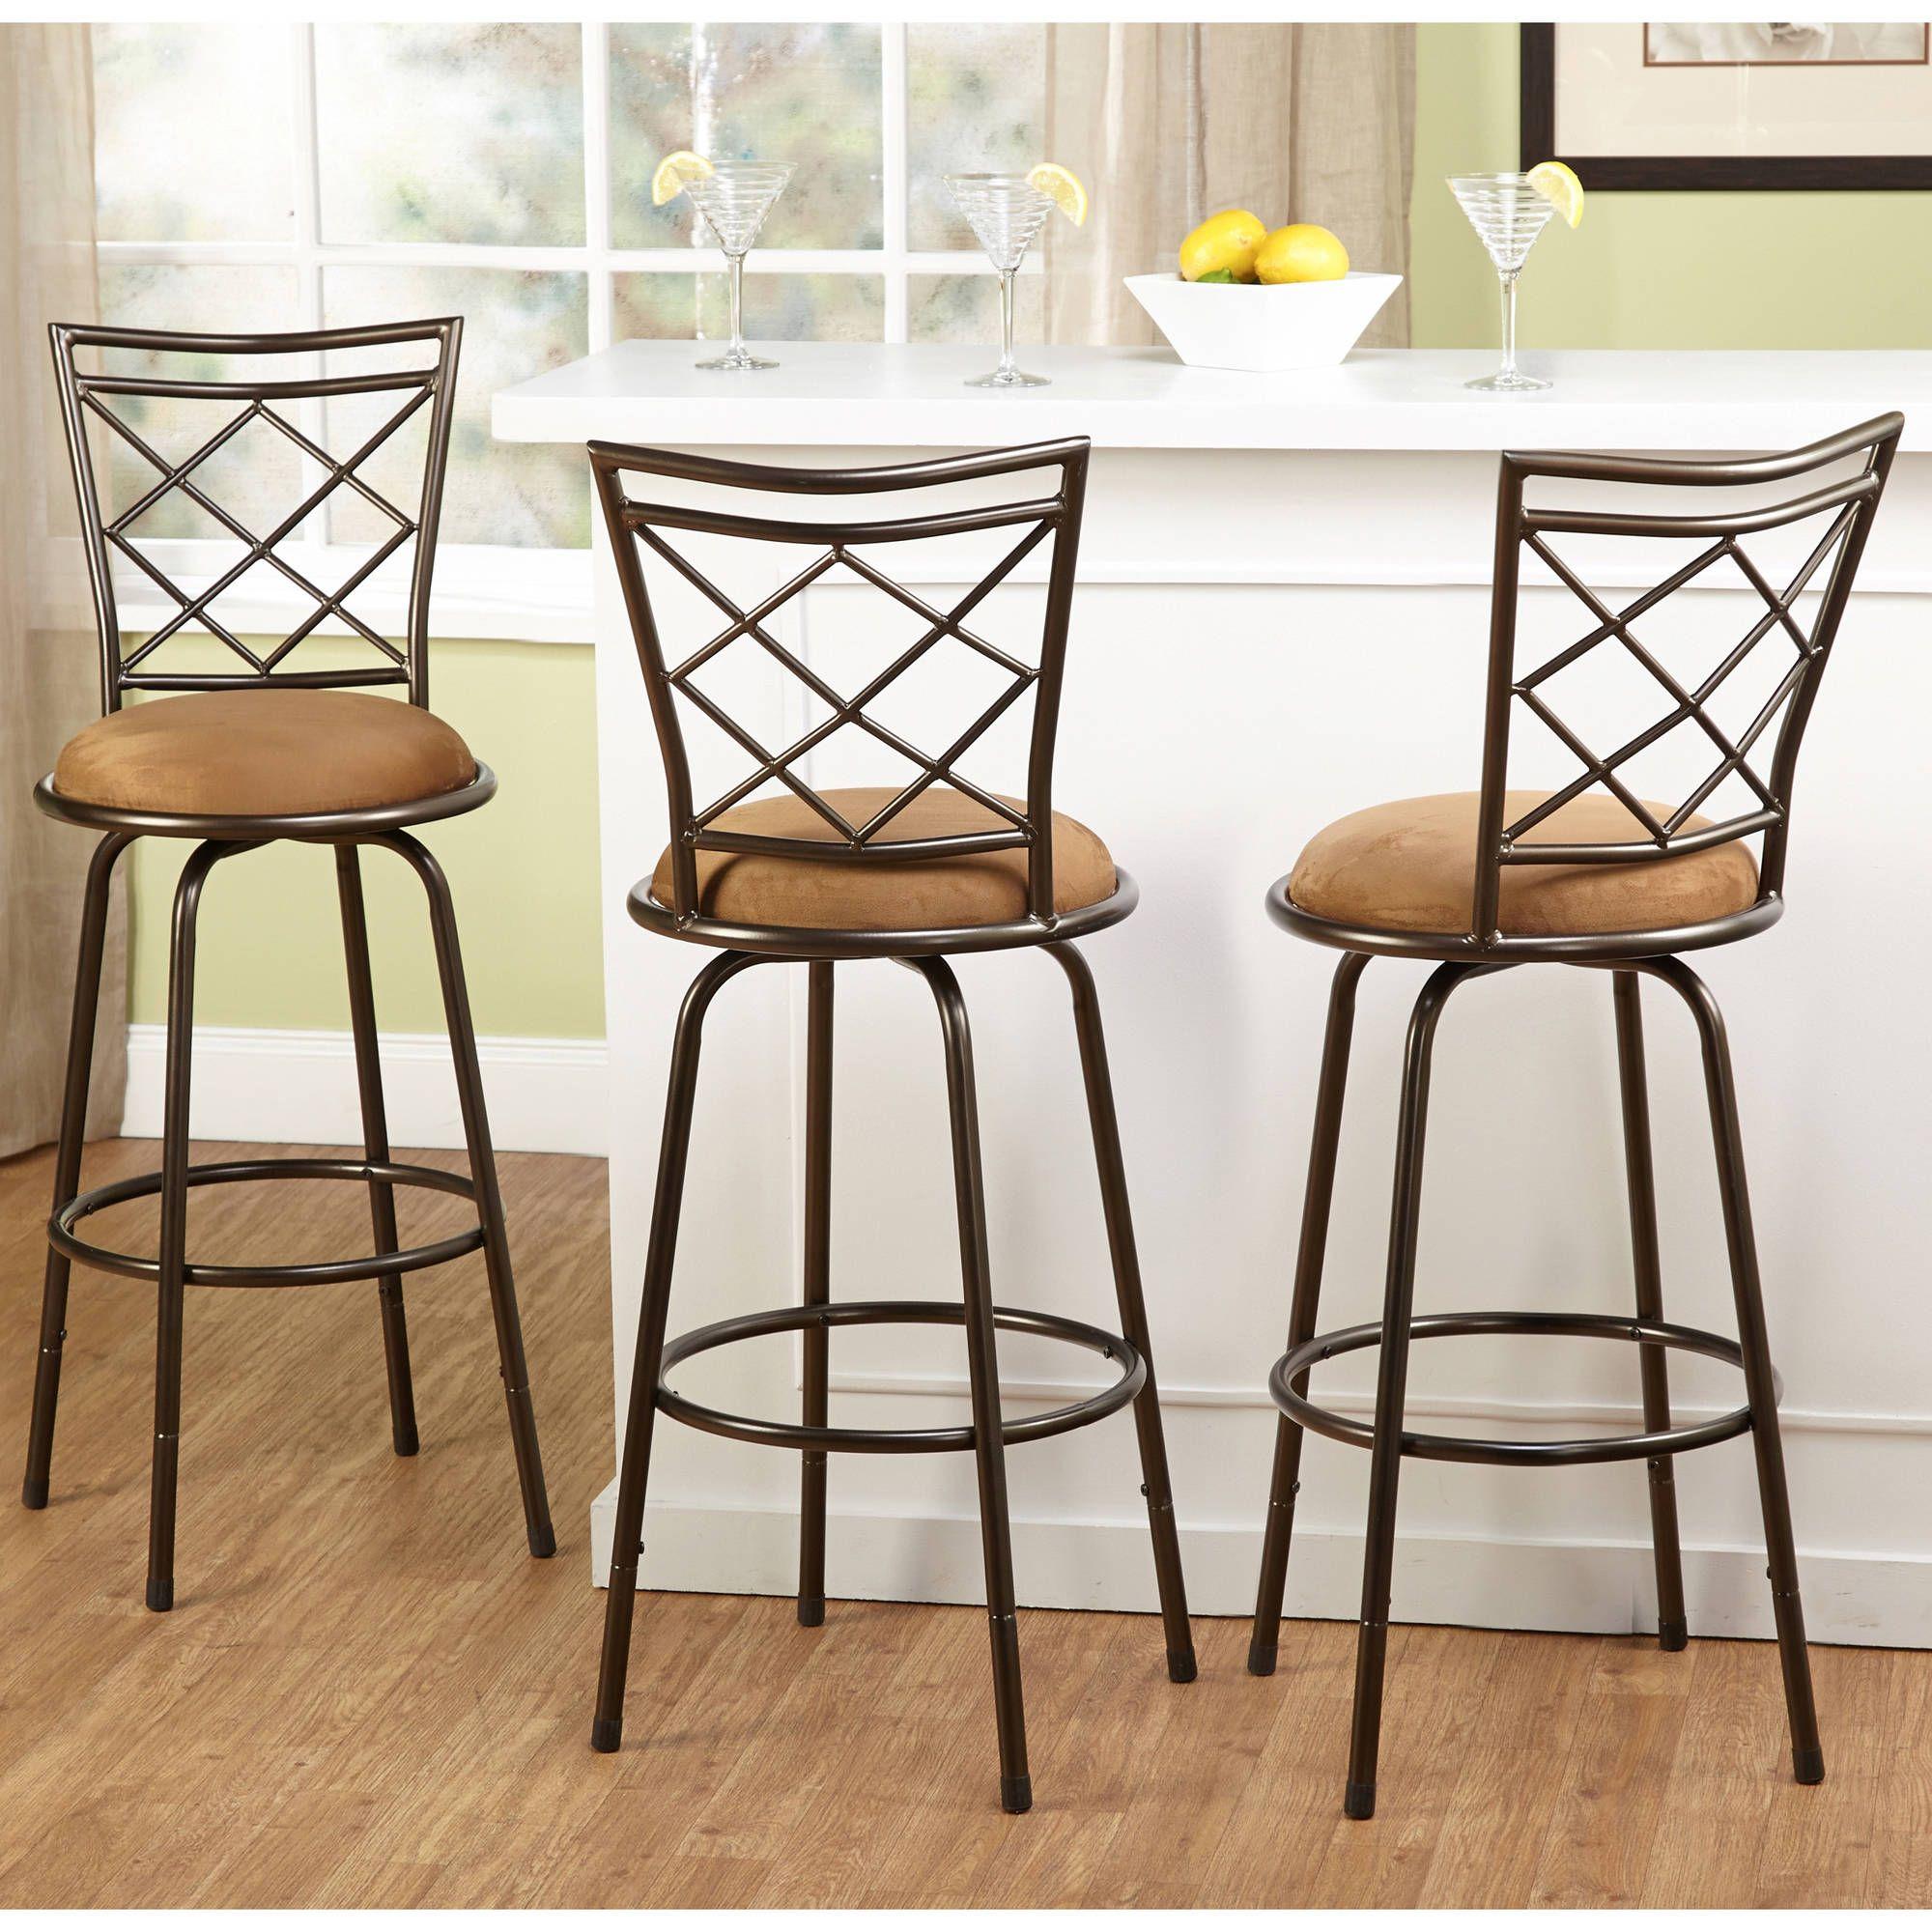 Stuhl Bar Hocker | Stühle | Pinterest | Stuhl, Hocker und Bar